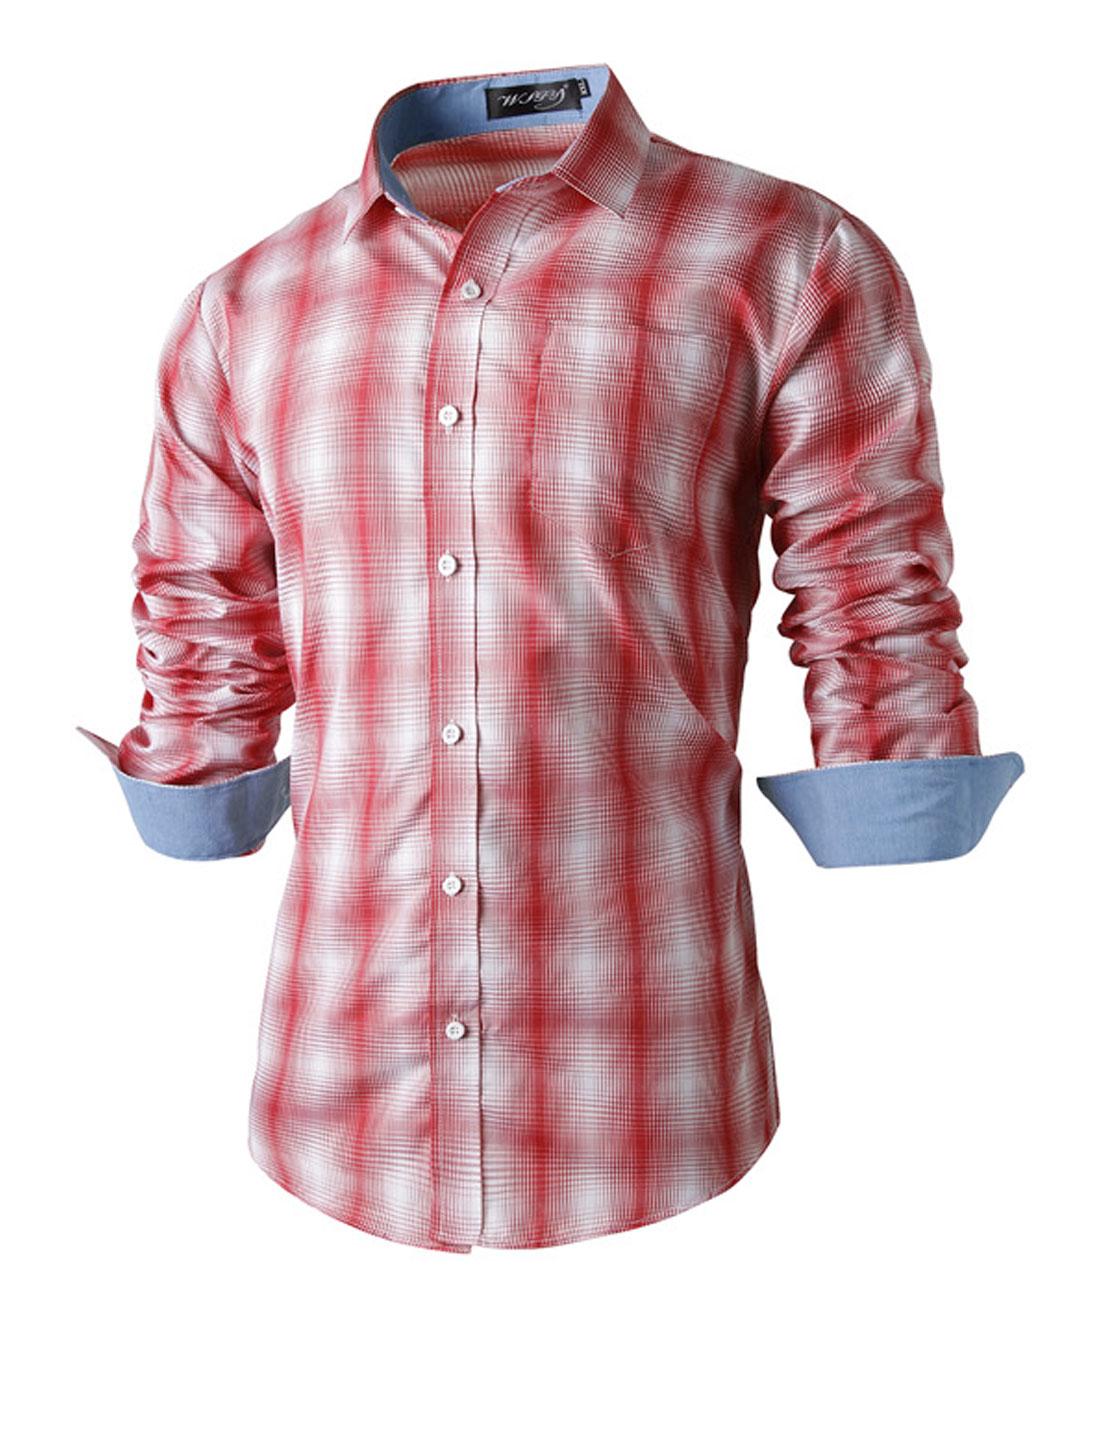 Azzuro Men Button Closure Point Collar Plaids Prints Shirts Pale Pink White M